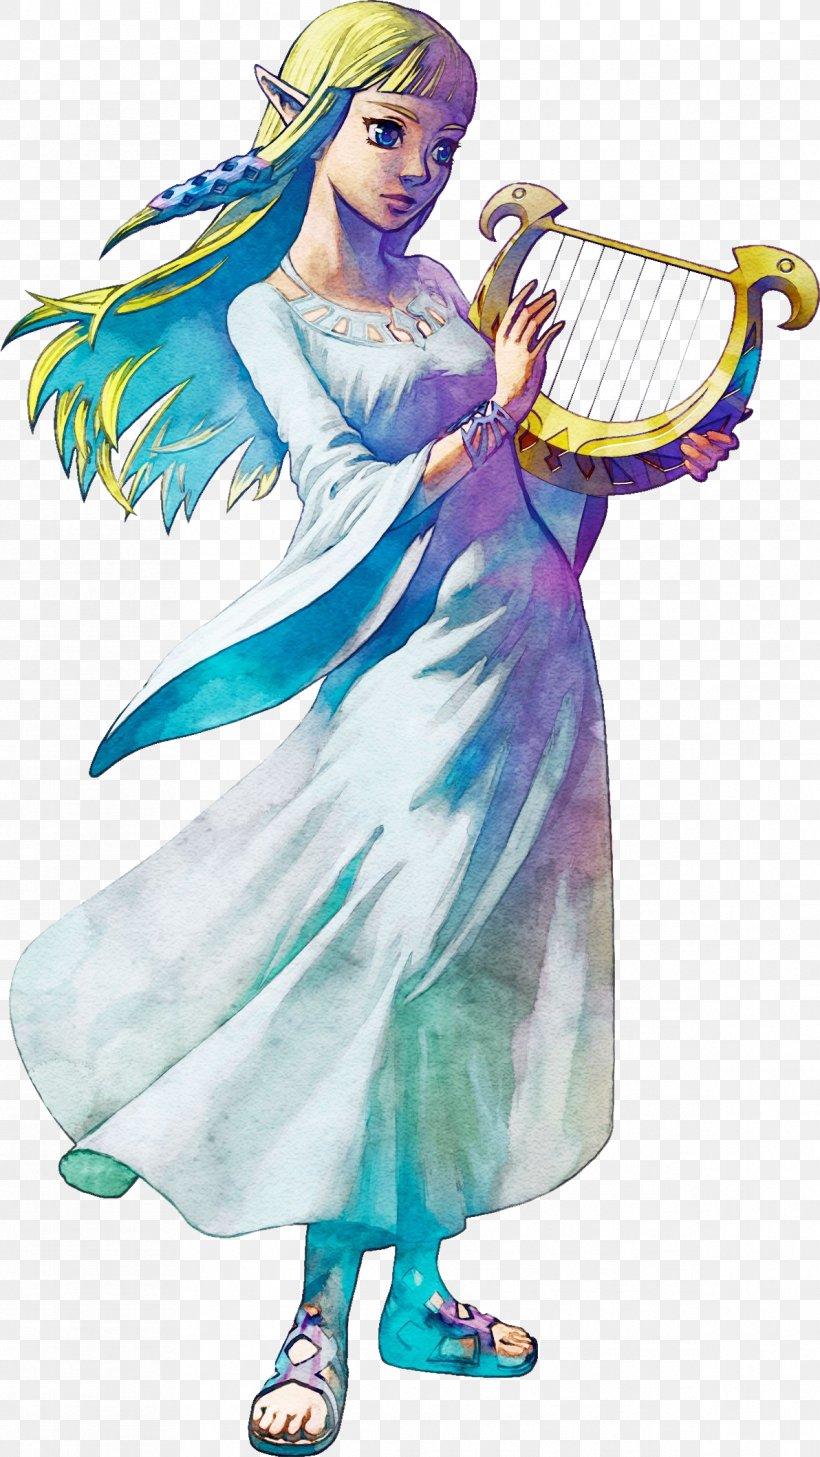 The Legend Of Zelda: Skyward Sword Princess Zelda The Legend Of Zelda: Ocarina Of Time Link The Legend Of Zelda: Twilight Princess HD, PNG, 1192x2119px, Legend Of Zelda Skyward Sword, Angel, Art, Characters Of The Legend Of Zelda, Clothing Download Free